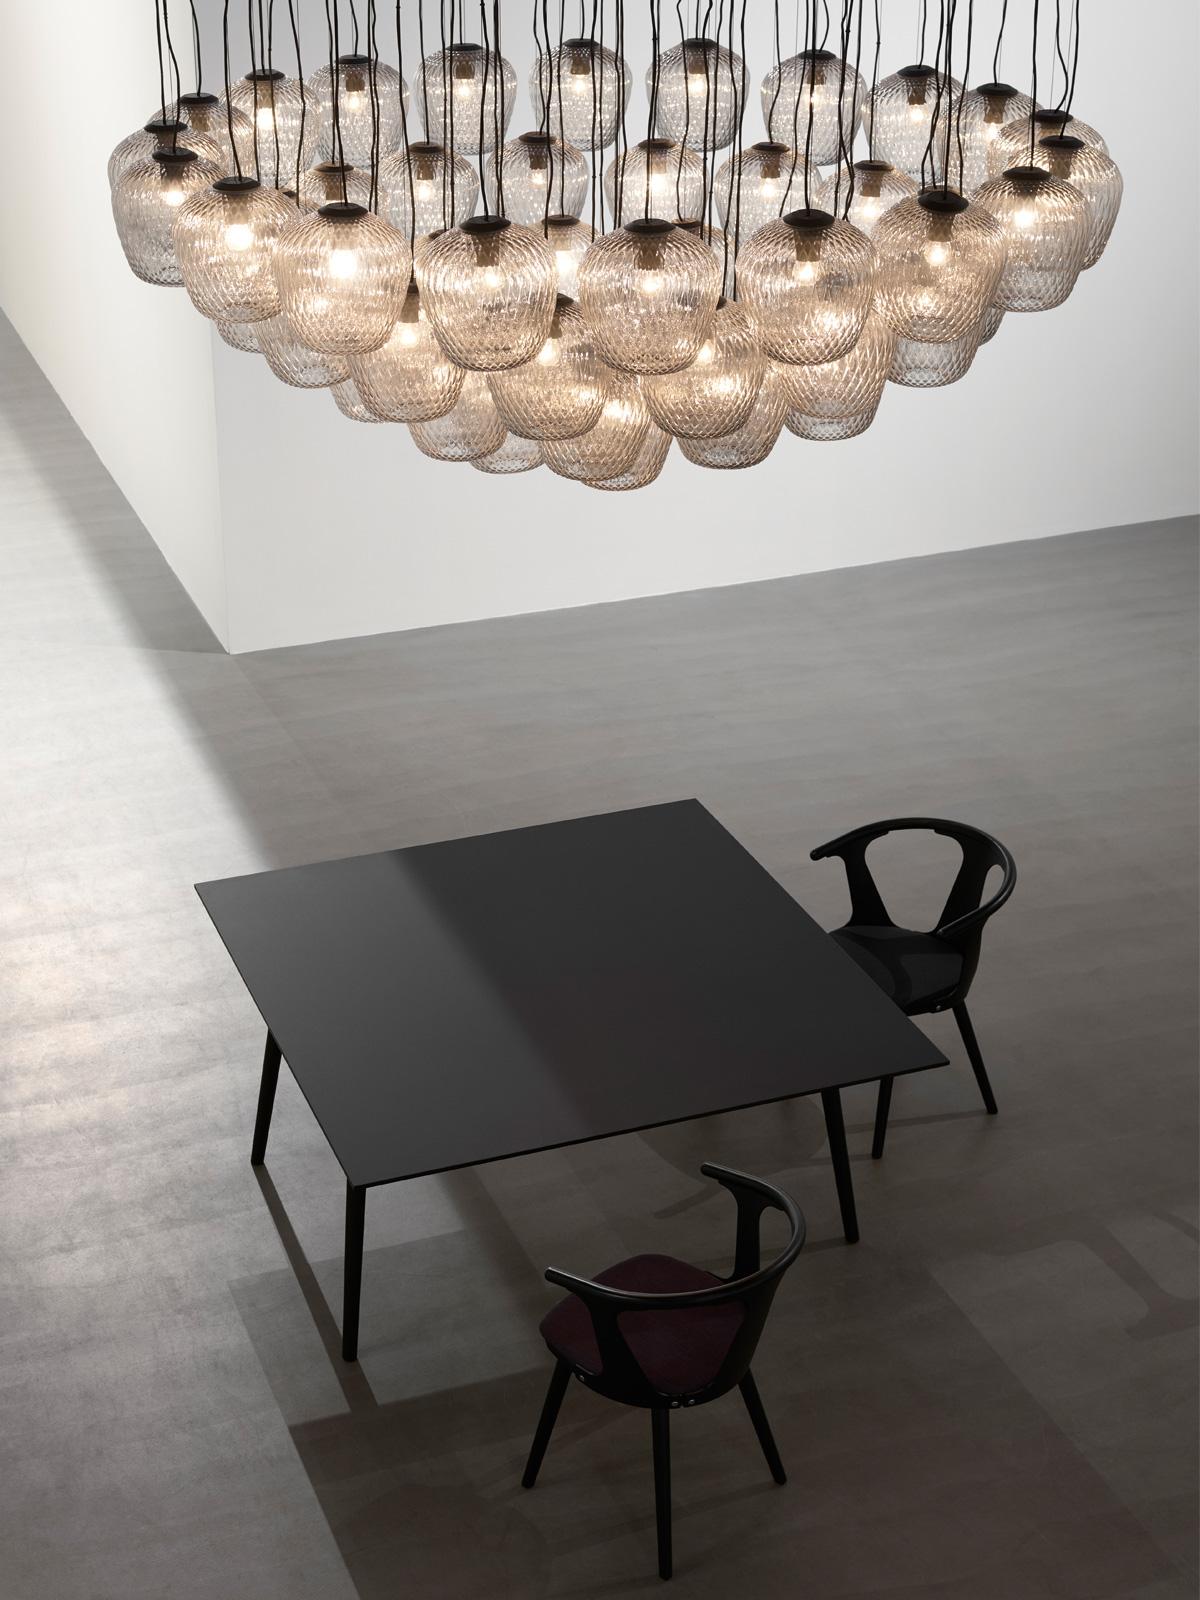 Blown Configuration &tradition #kronleuchter #chandelier #glas